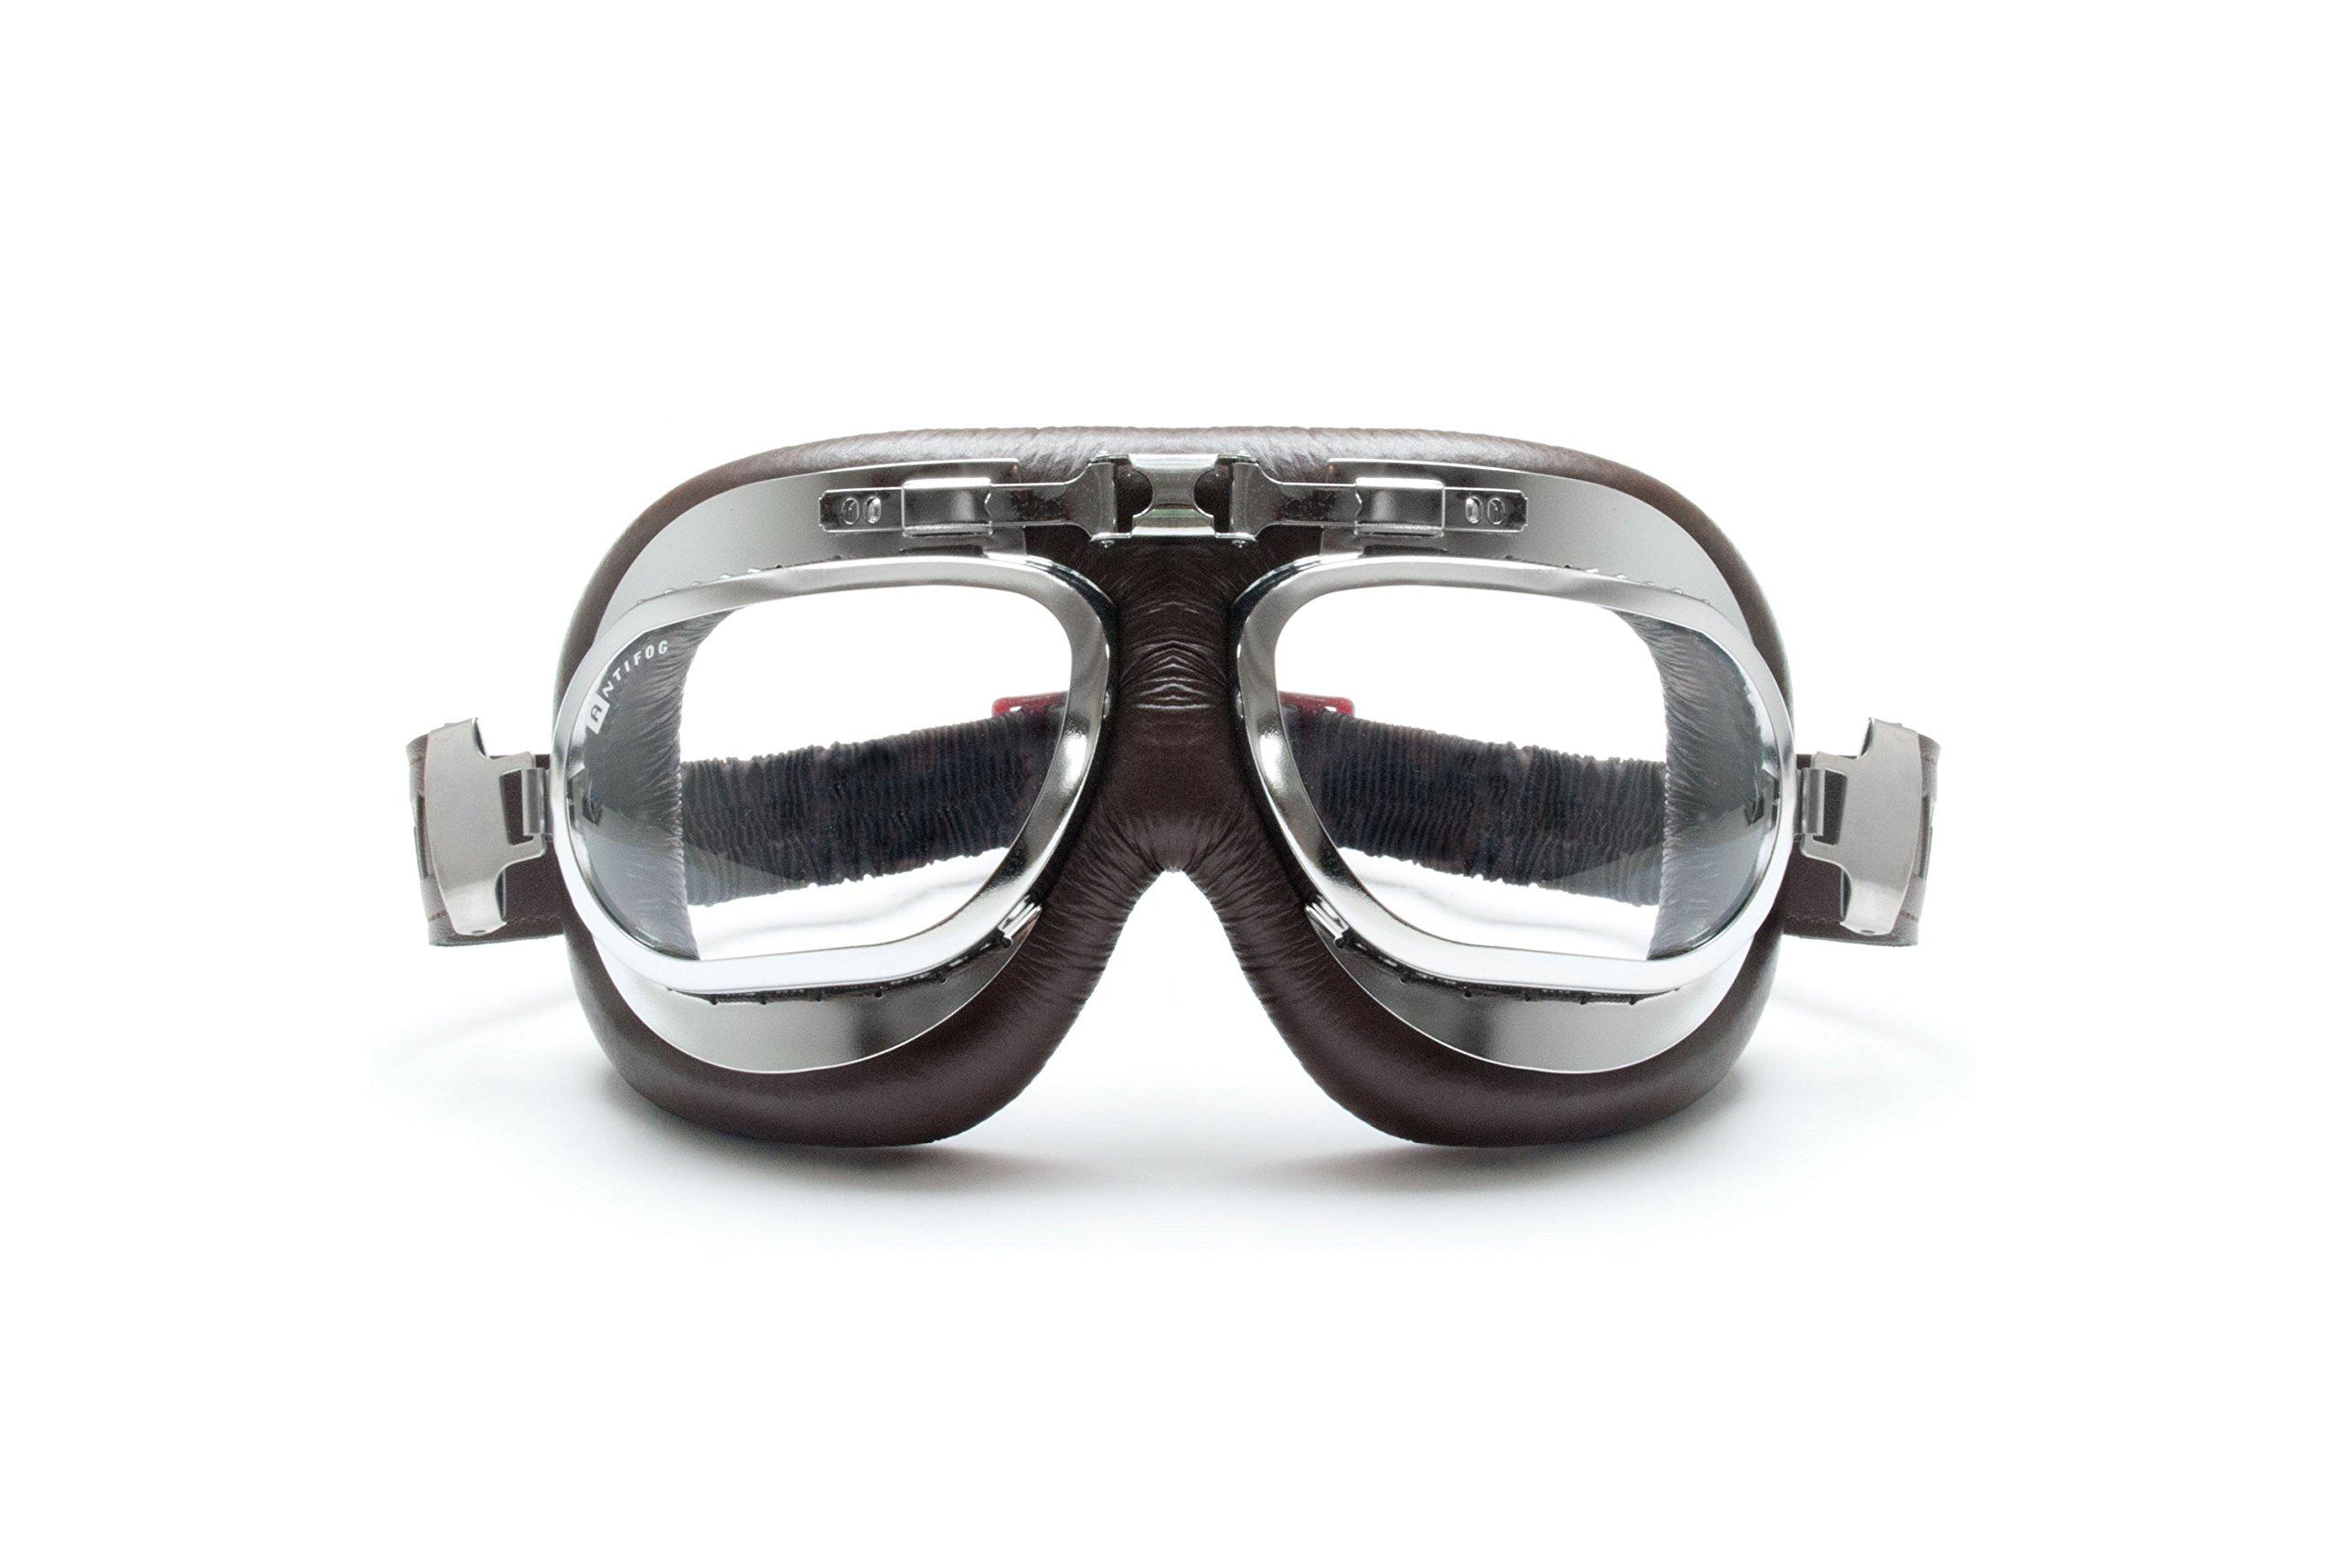 Masque vintage aviator moto style 60's 1